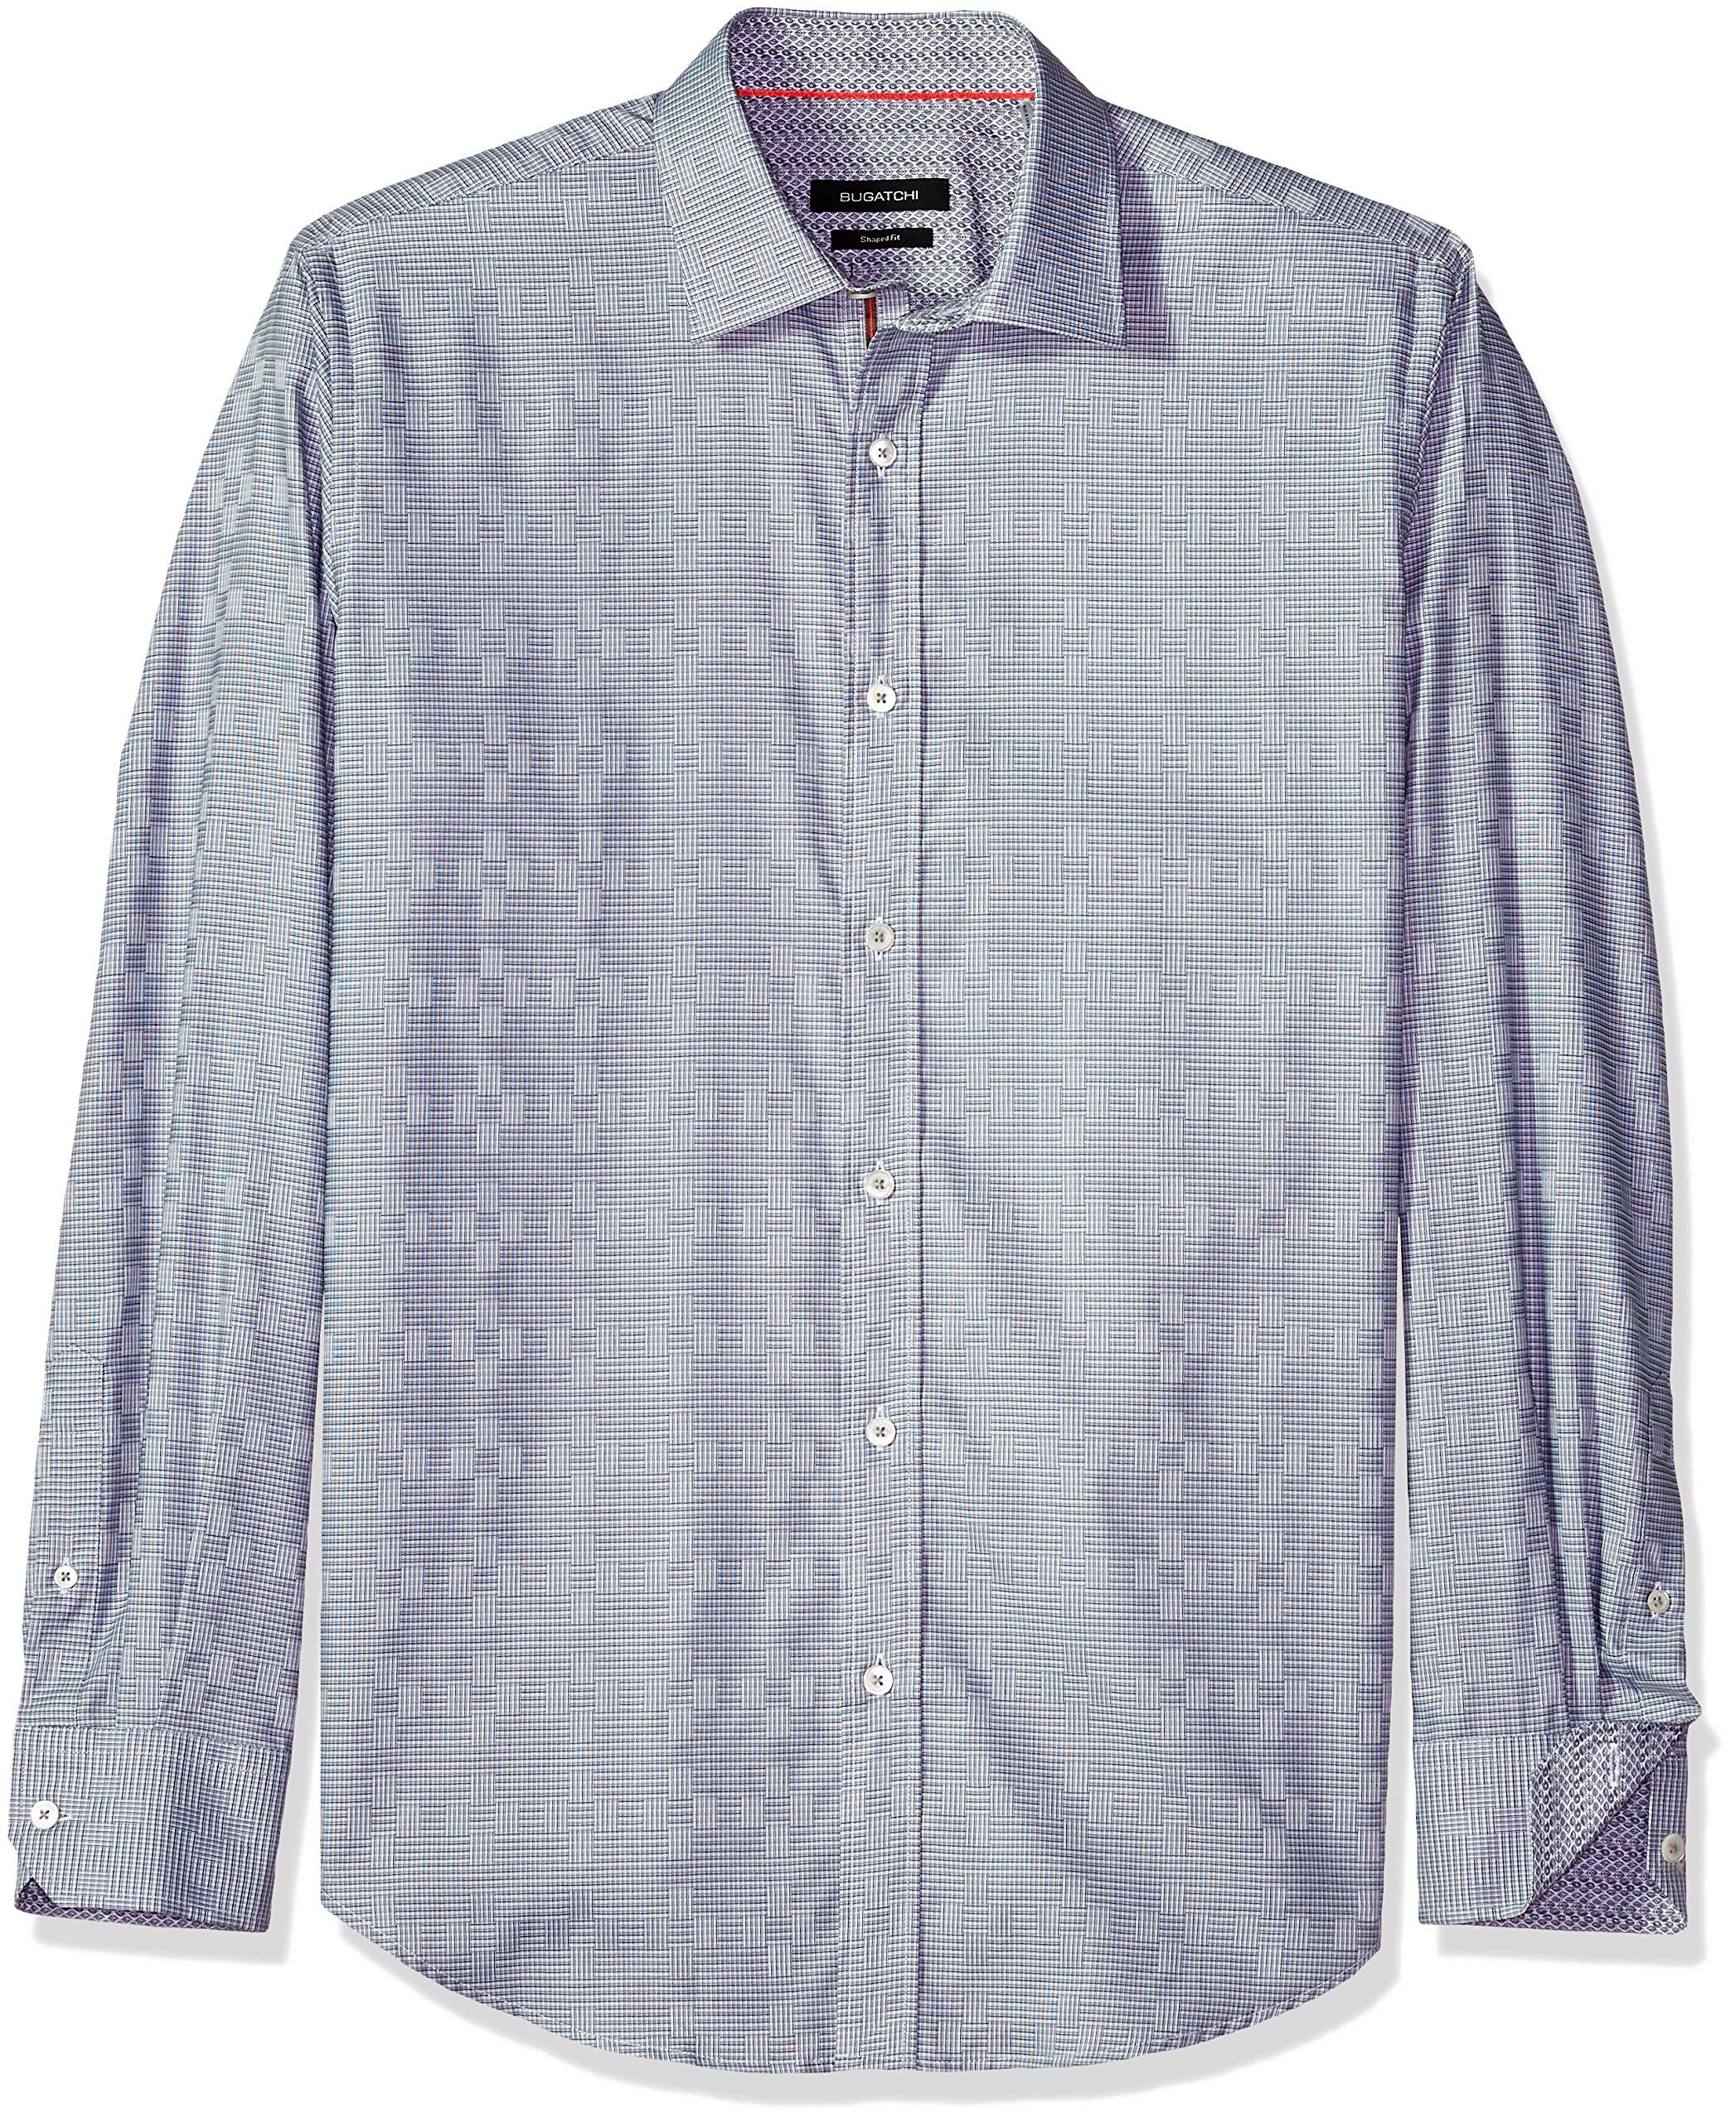 Bugatchi Men's Small Houndstooh Pattern Shaped Fit Cotton Long Sleeve Shirt, Platinum, XXL